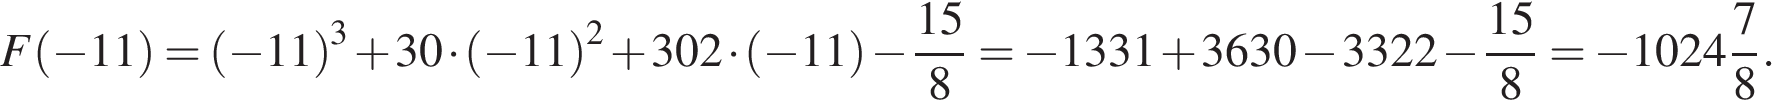 http://reshuege.ru/formula/aa/aac05c5eaea096932bc751957aa5780ap.png